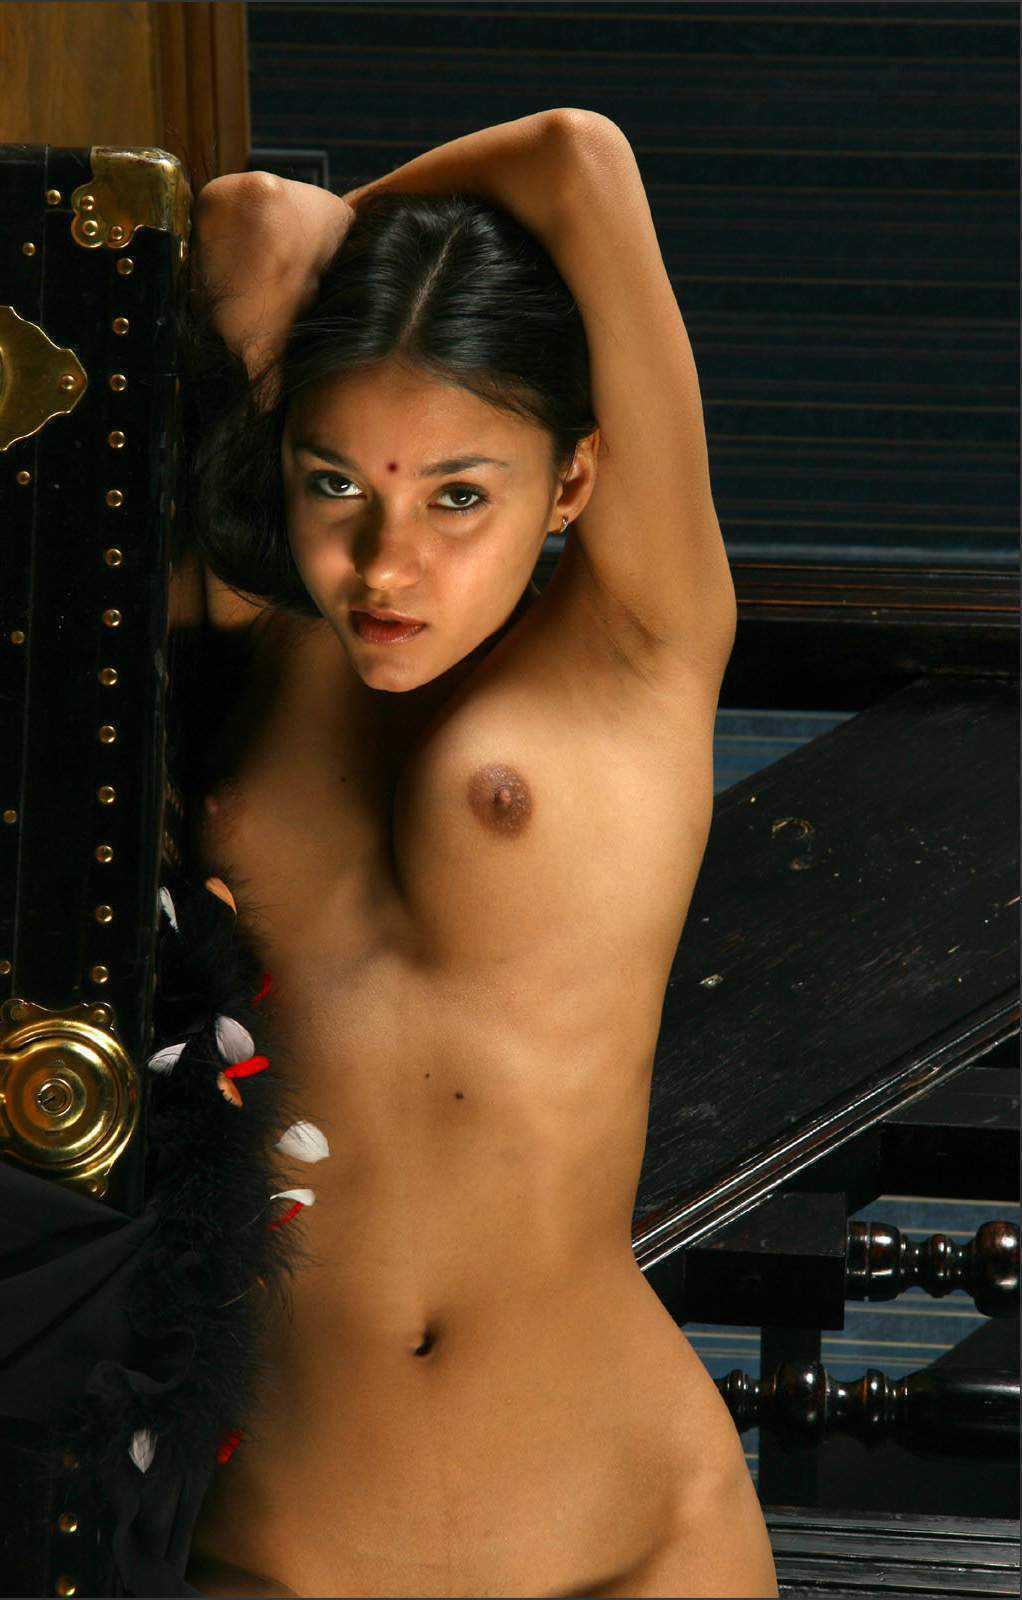 Hot Sexy Girls Single Porn Village Girl School Indian Nude